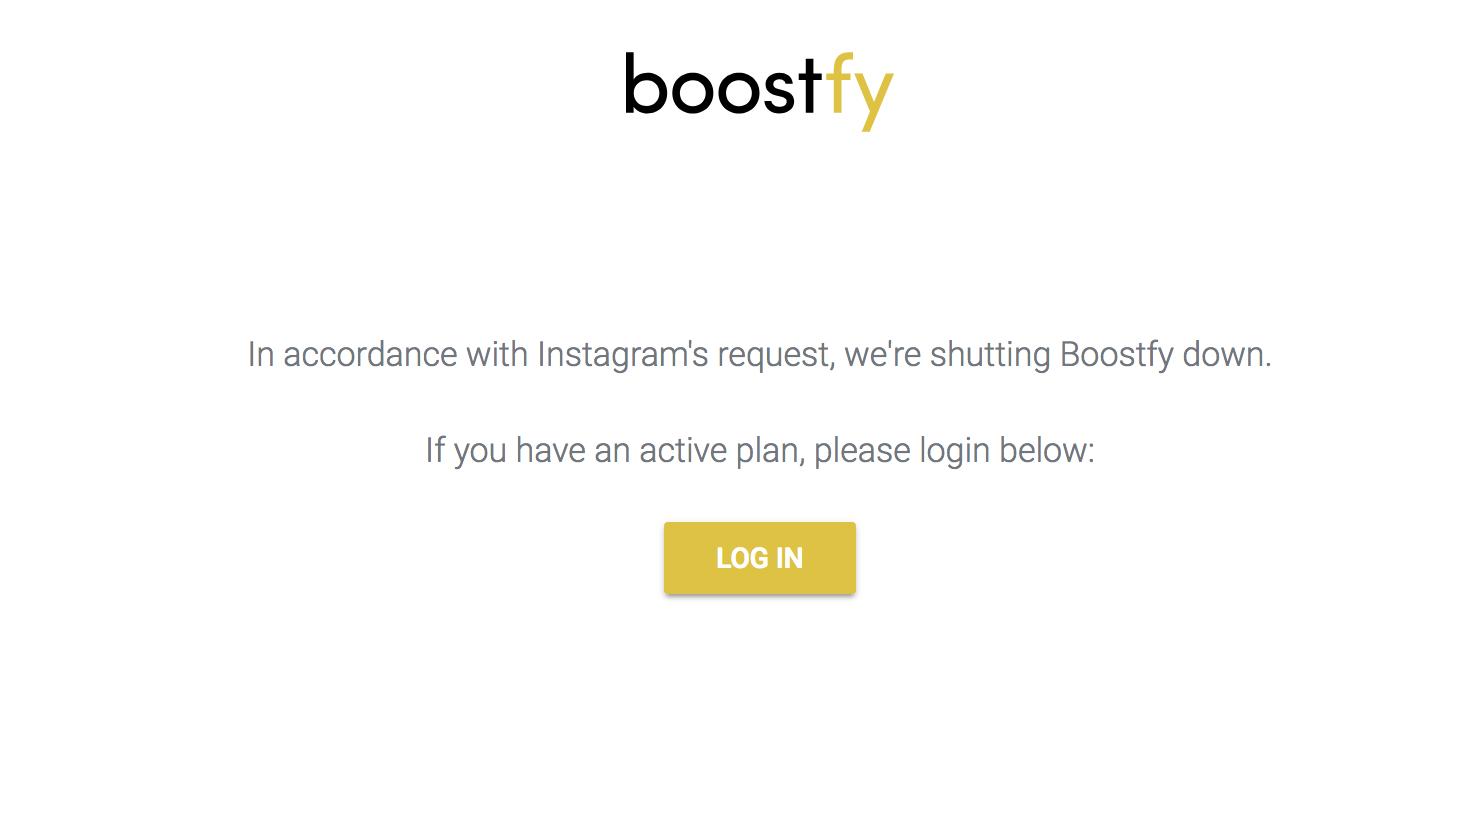 Boostfy Shutdown & The Best Alternatives